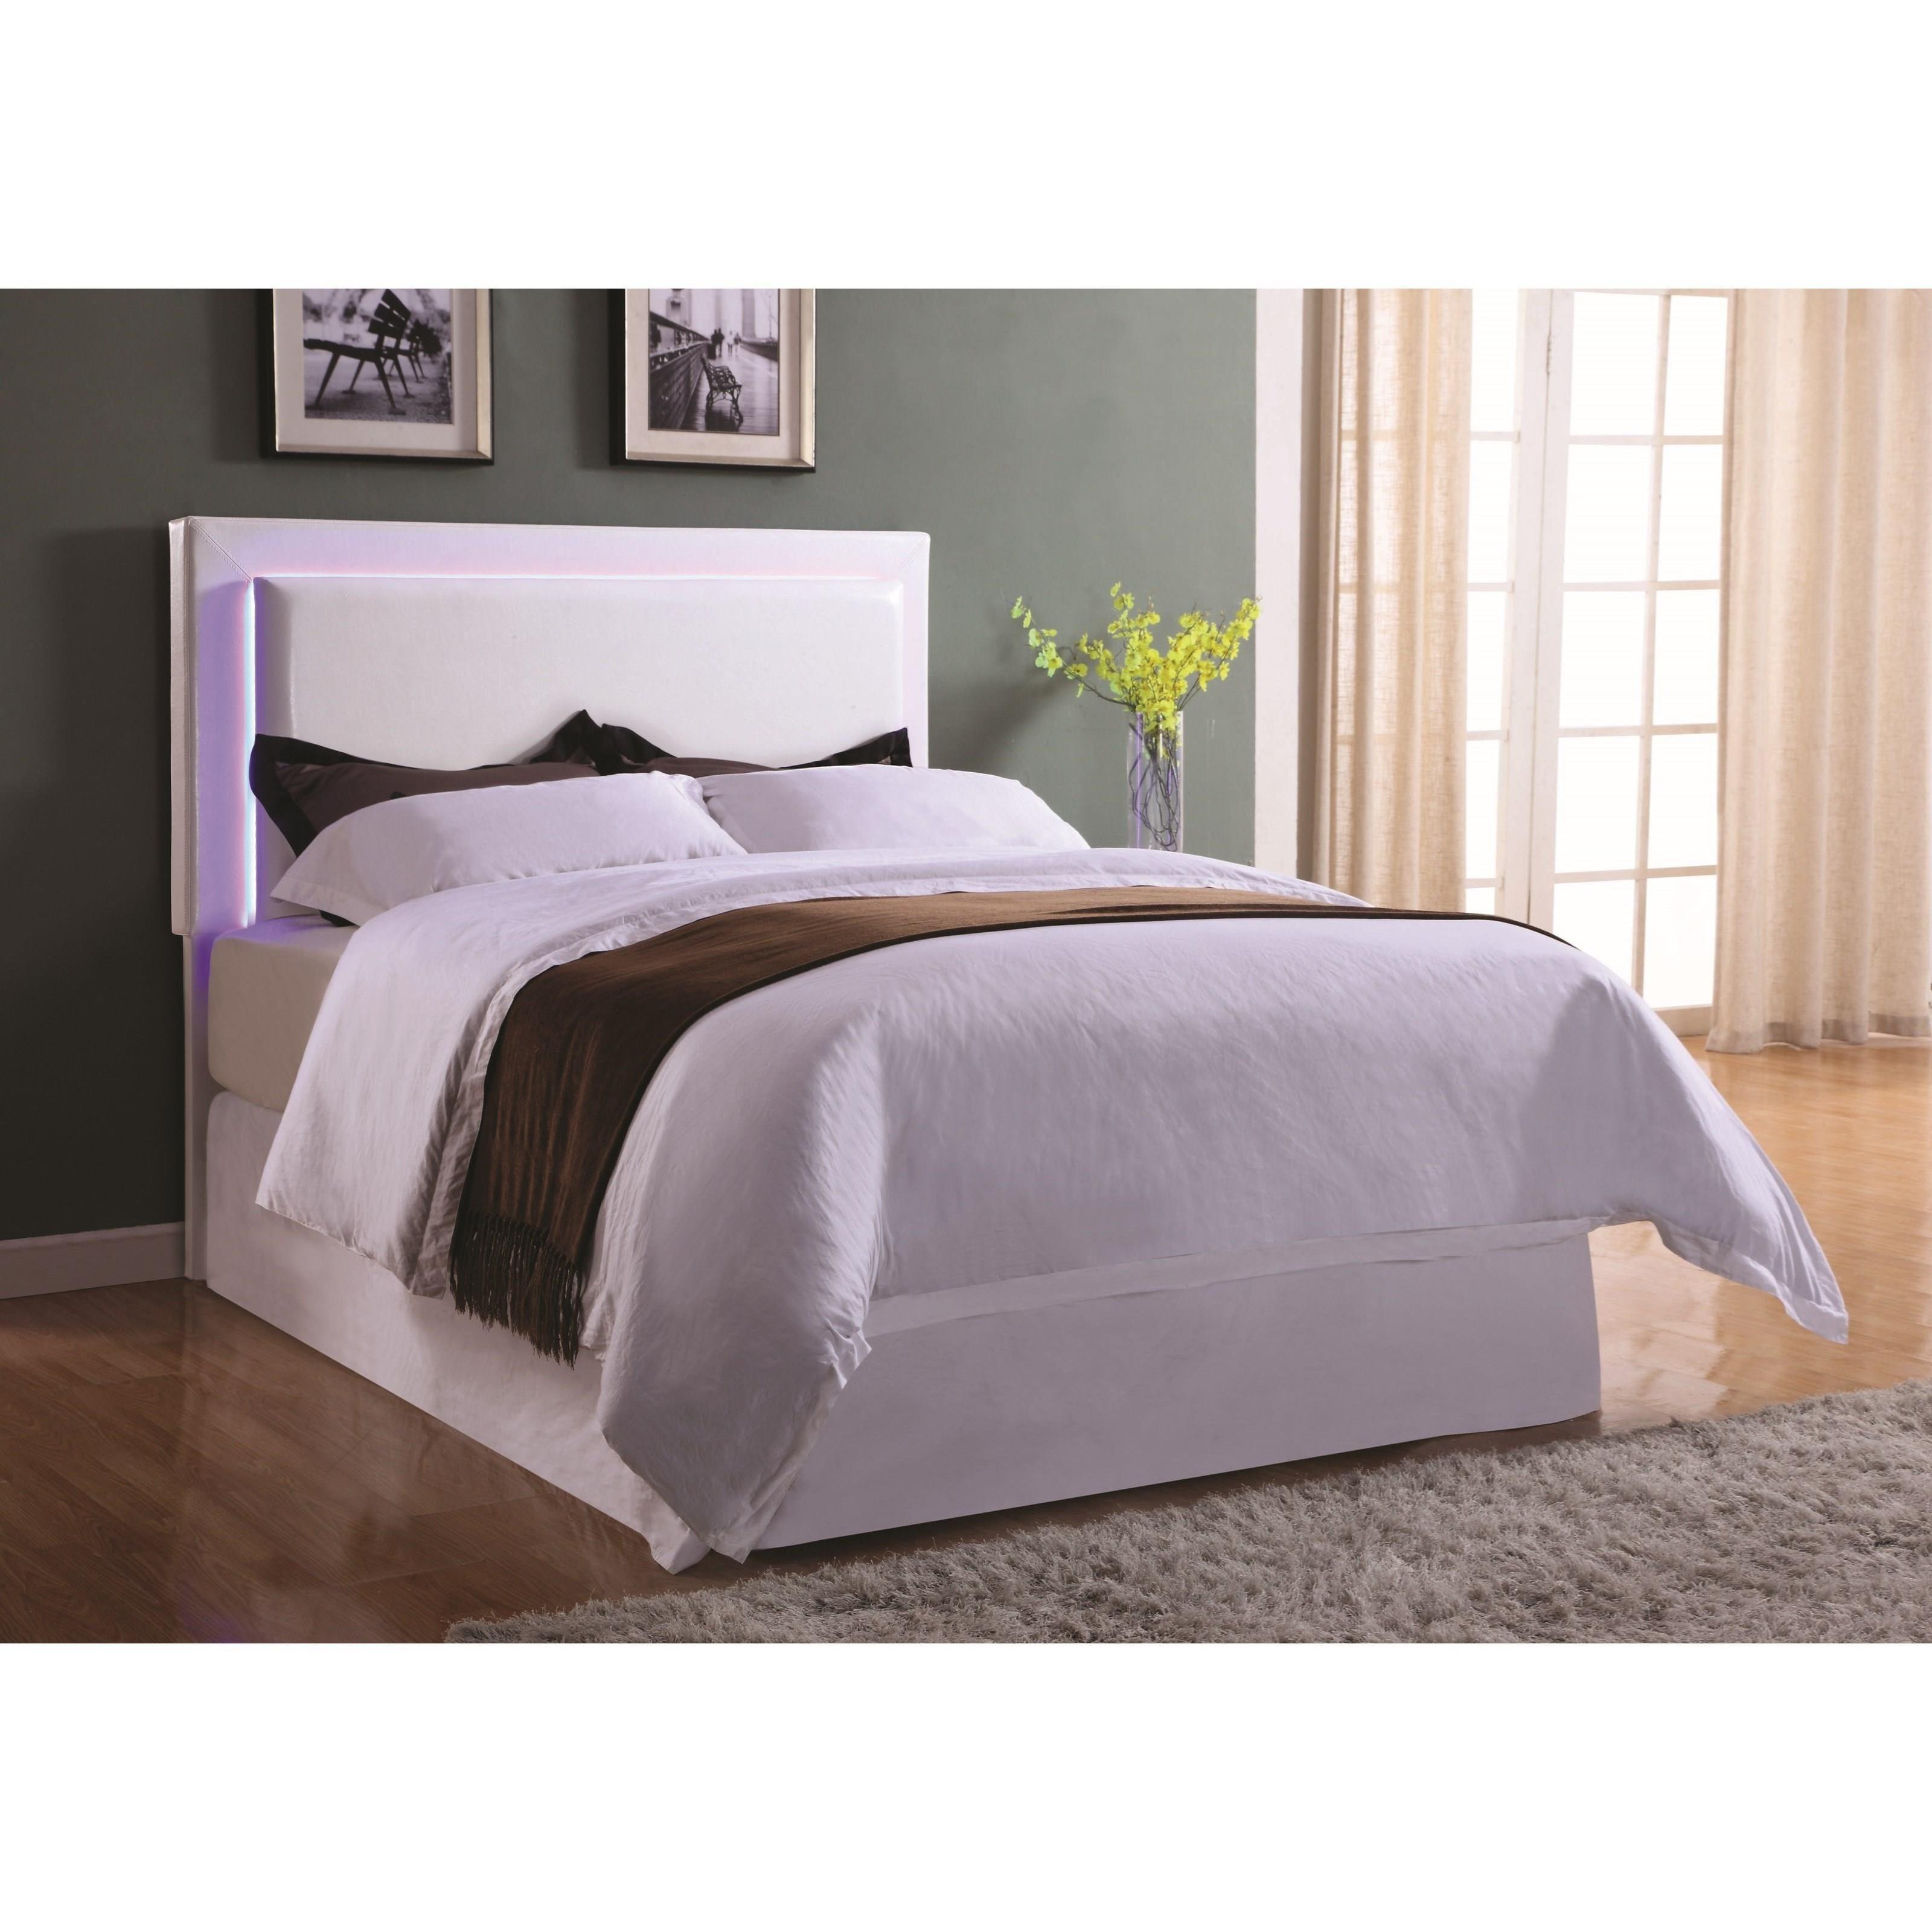 coaster upholstered beds upholstered king headboard with led lights